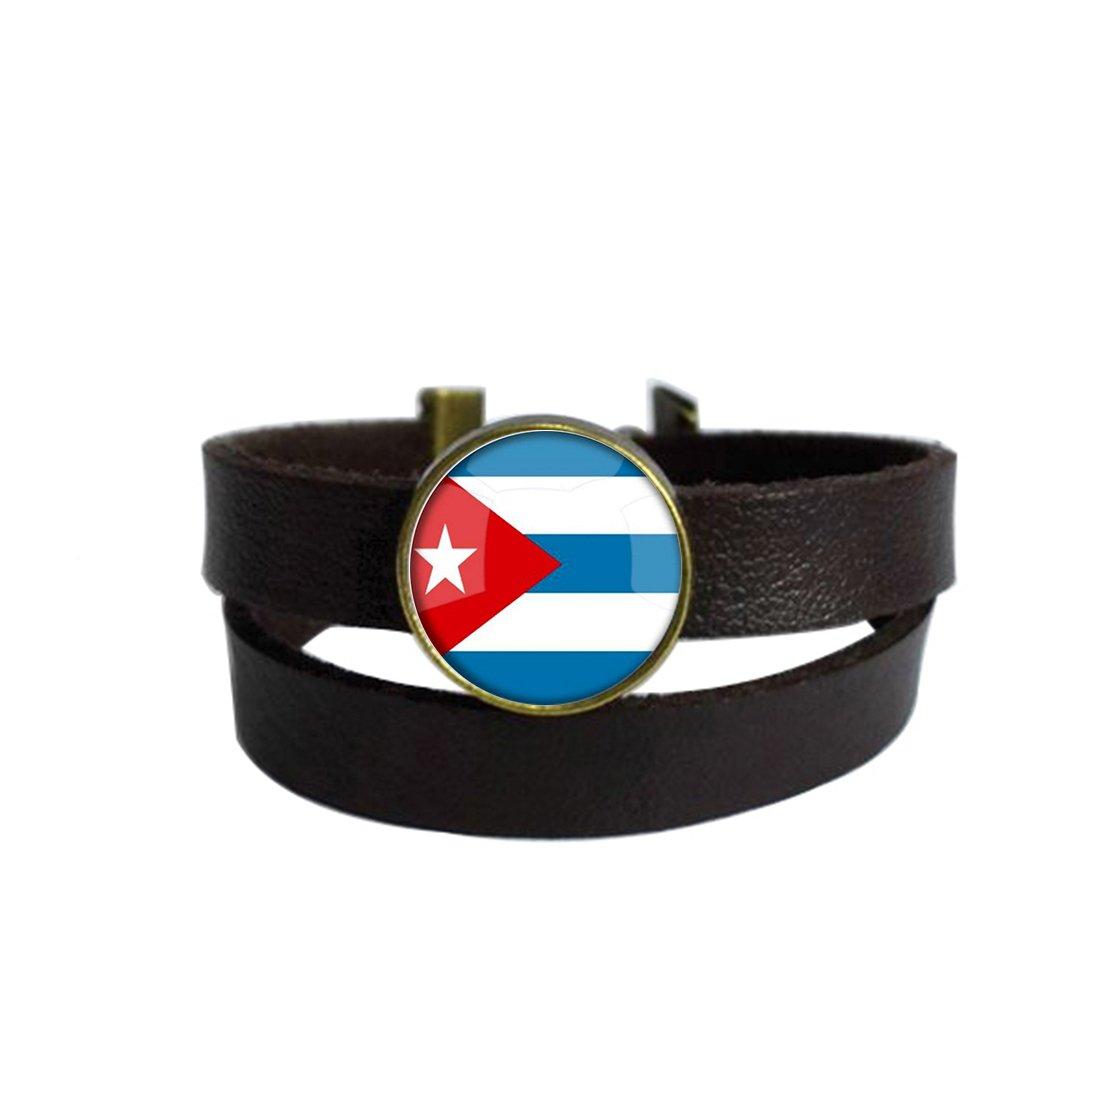 LooPoP Vintage Punk Dark Brown Leather Bracelet The Republic Of Cuba National Flag Belt Wrap Cuff Bangle Adjustable